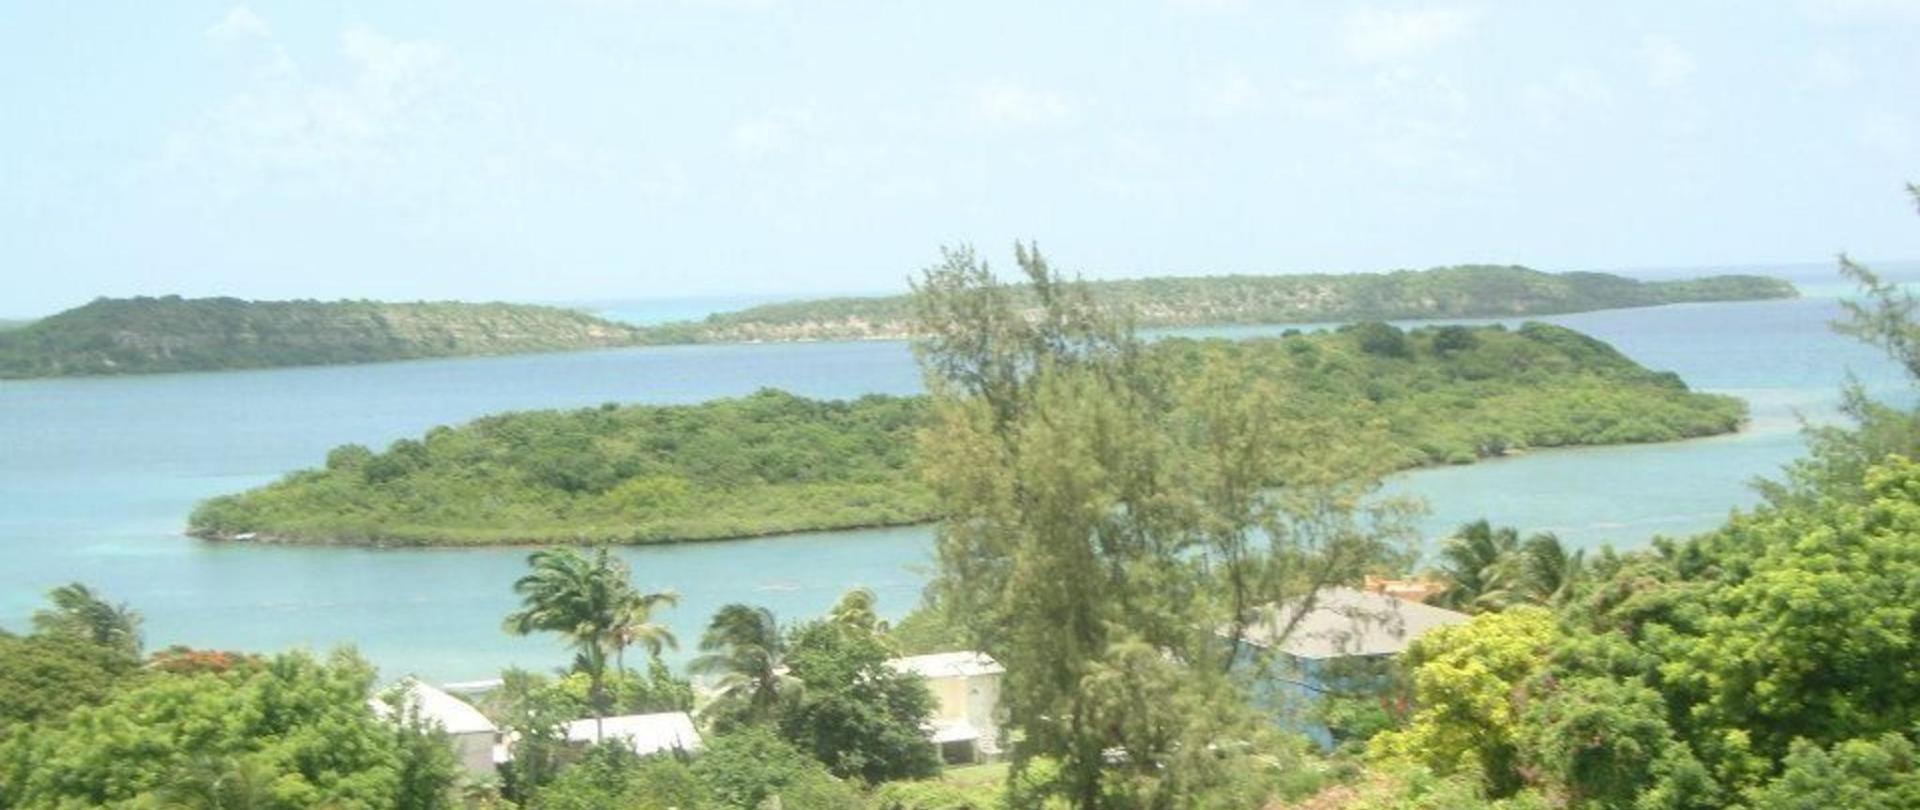 Ellen Bay With Islands in Background